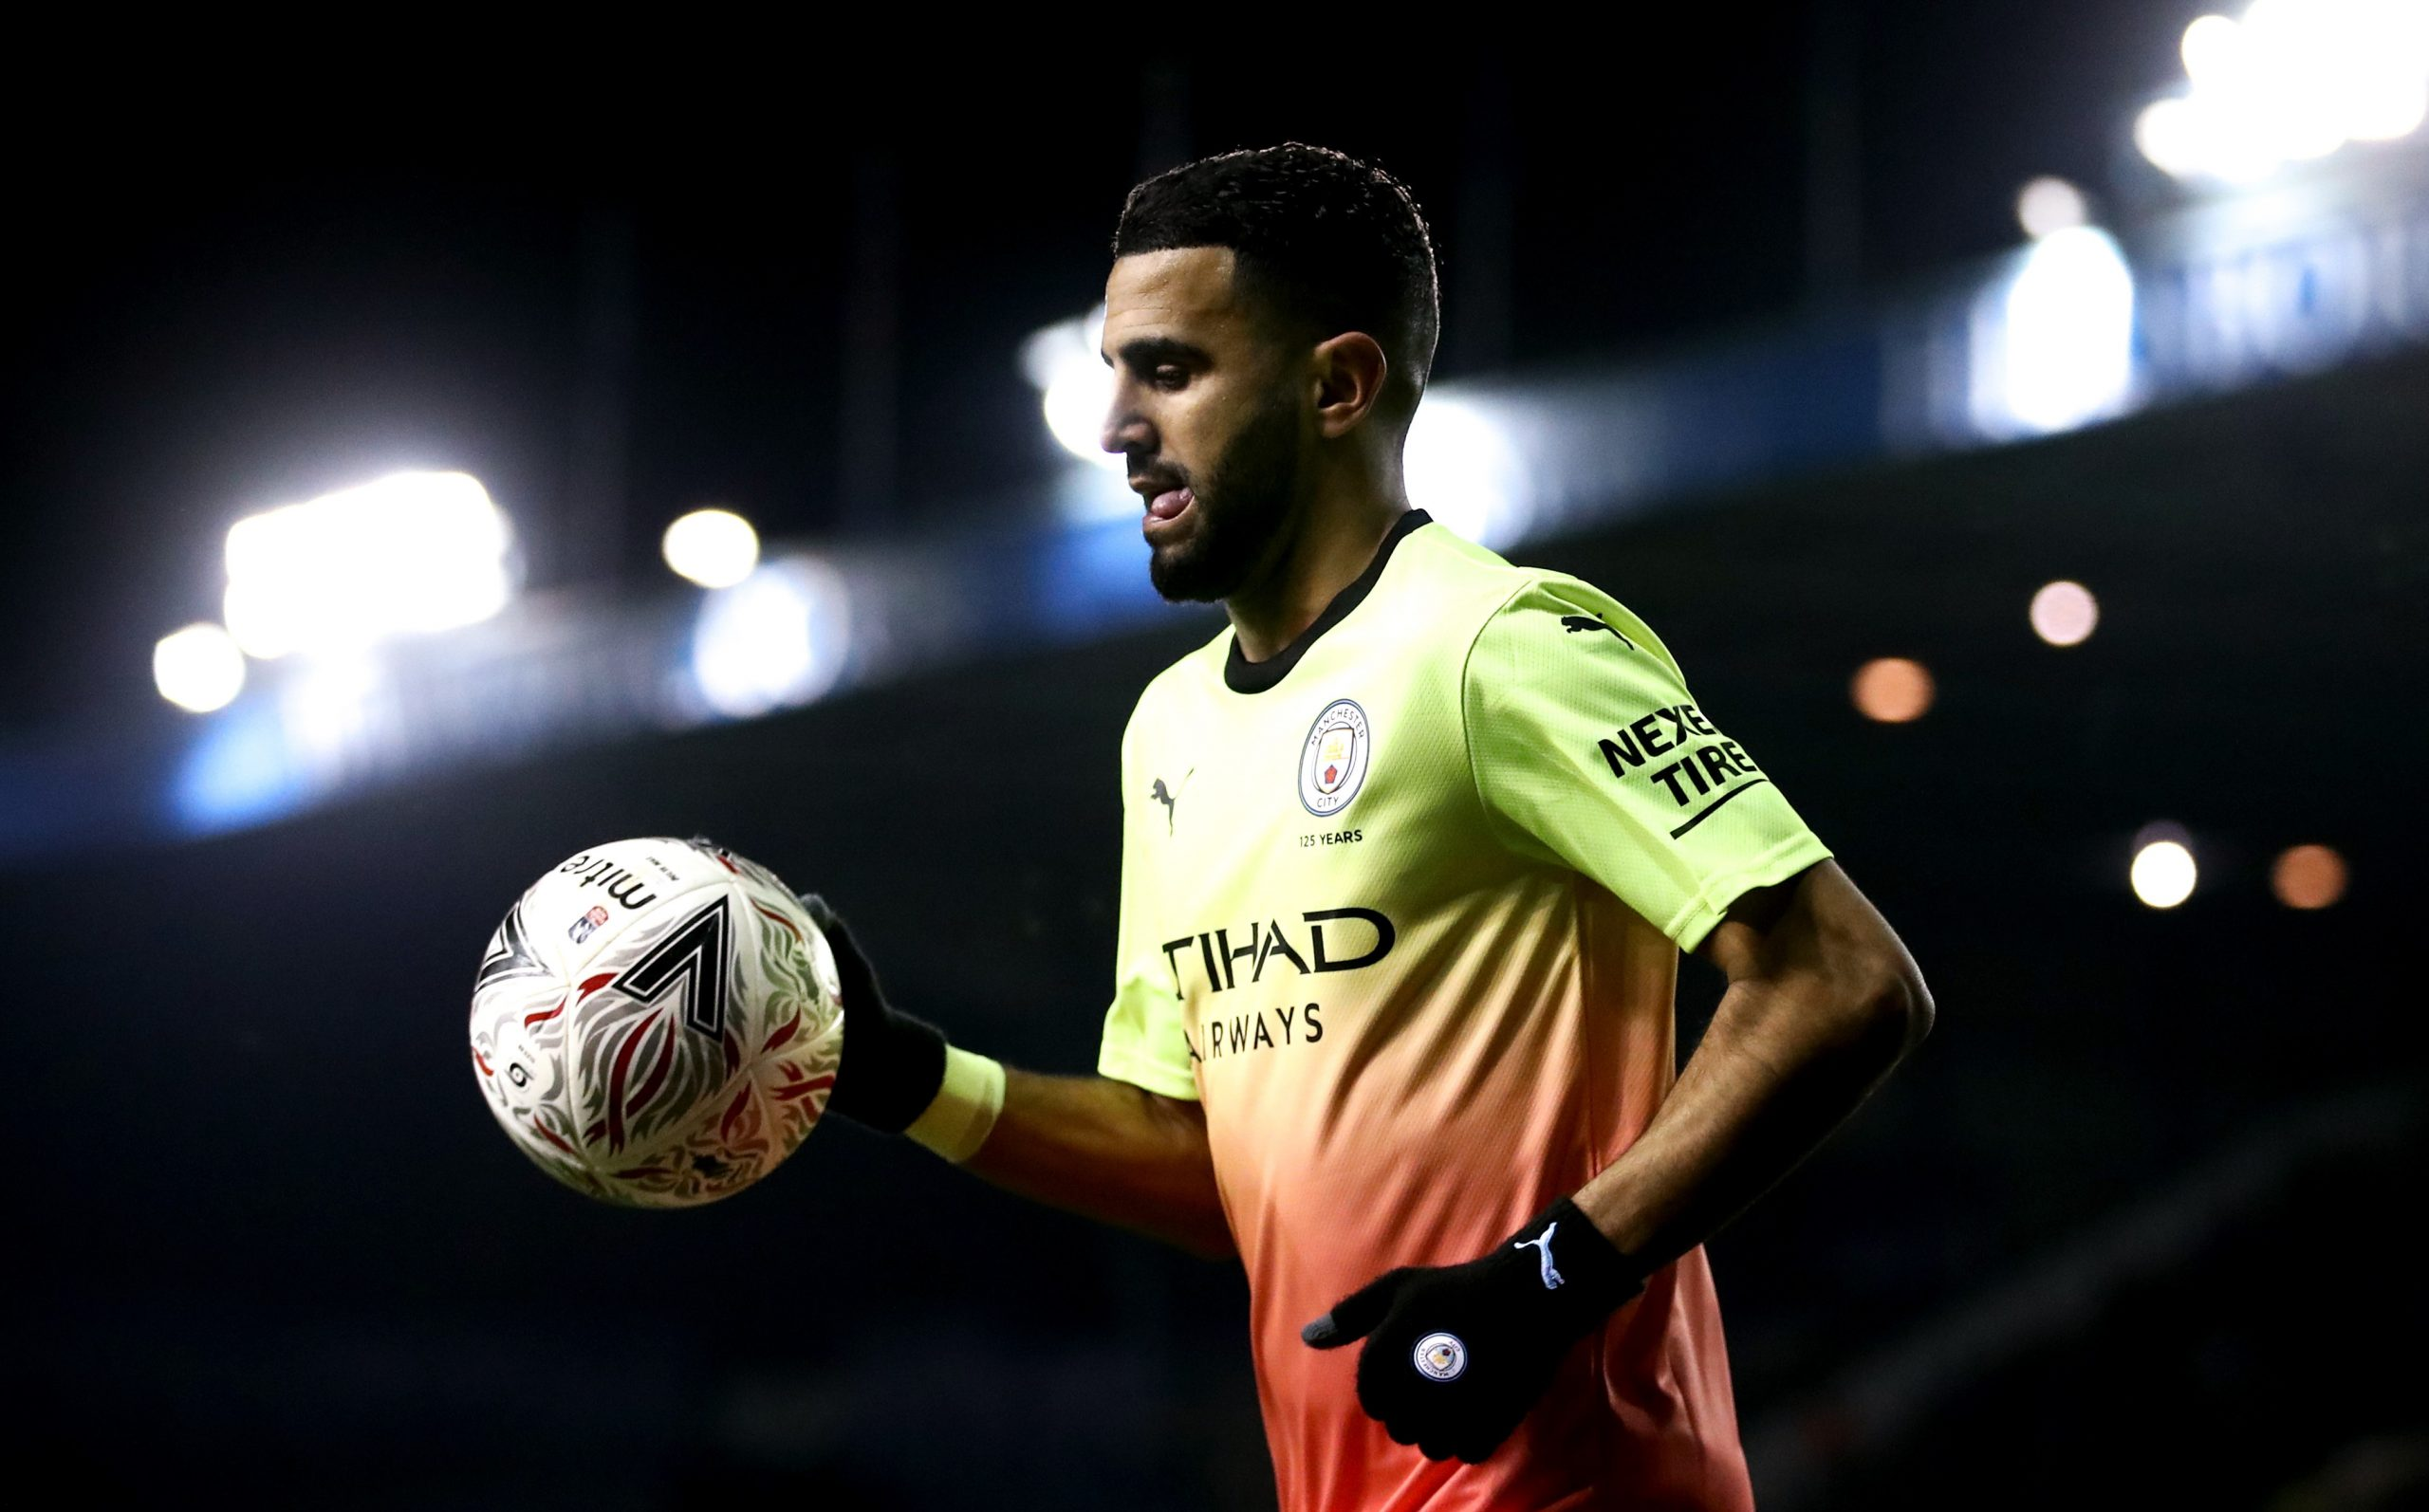 Man City veut prolonger Mahrez jusqu'en 2026 — International